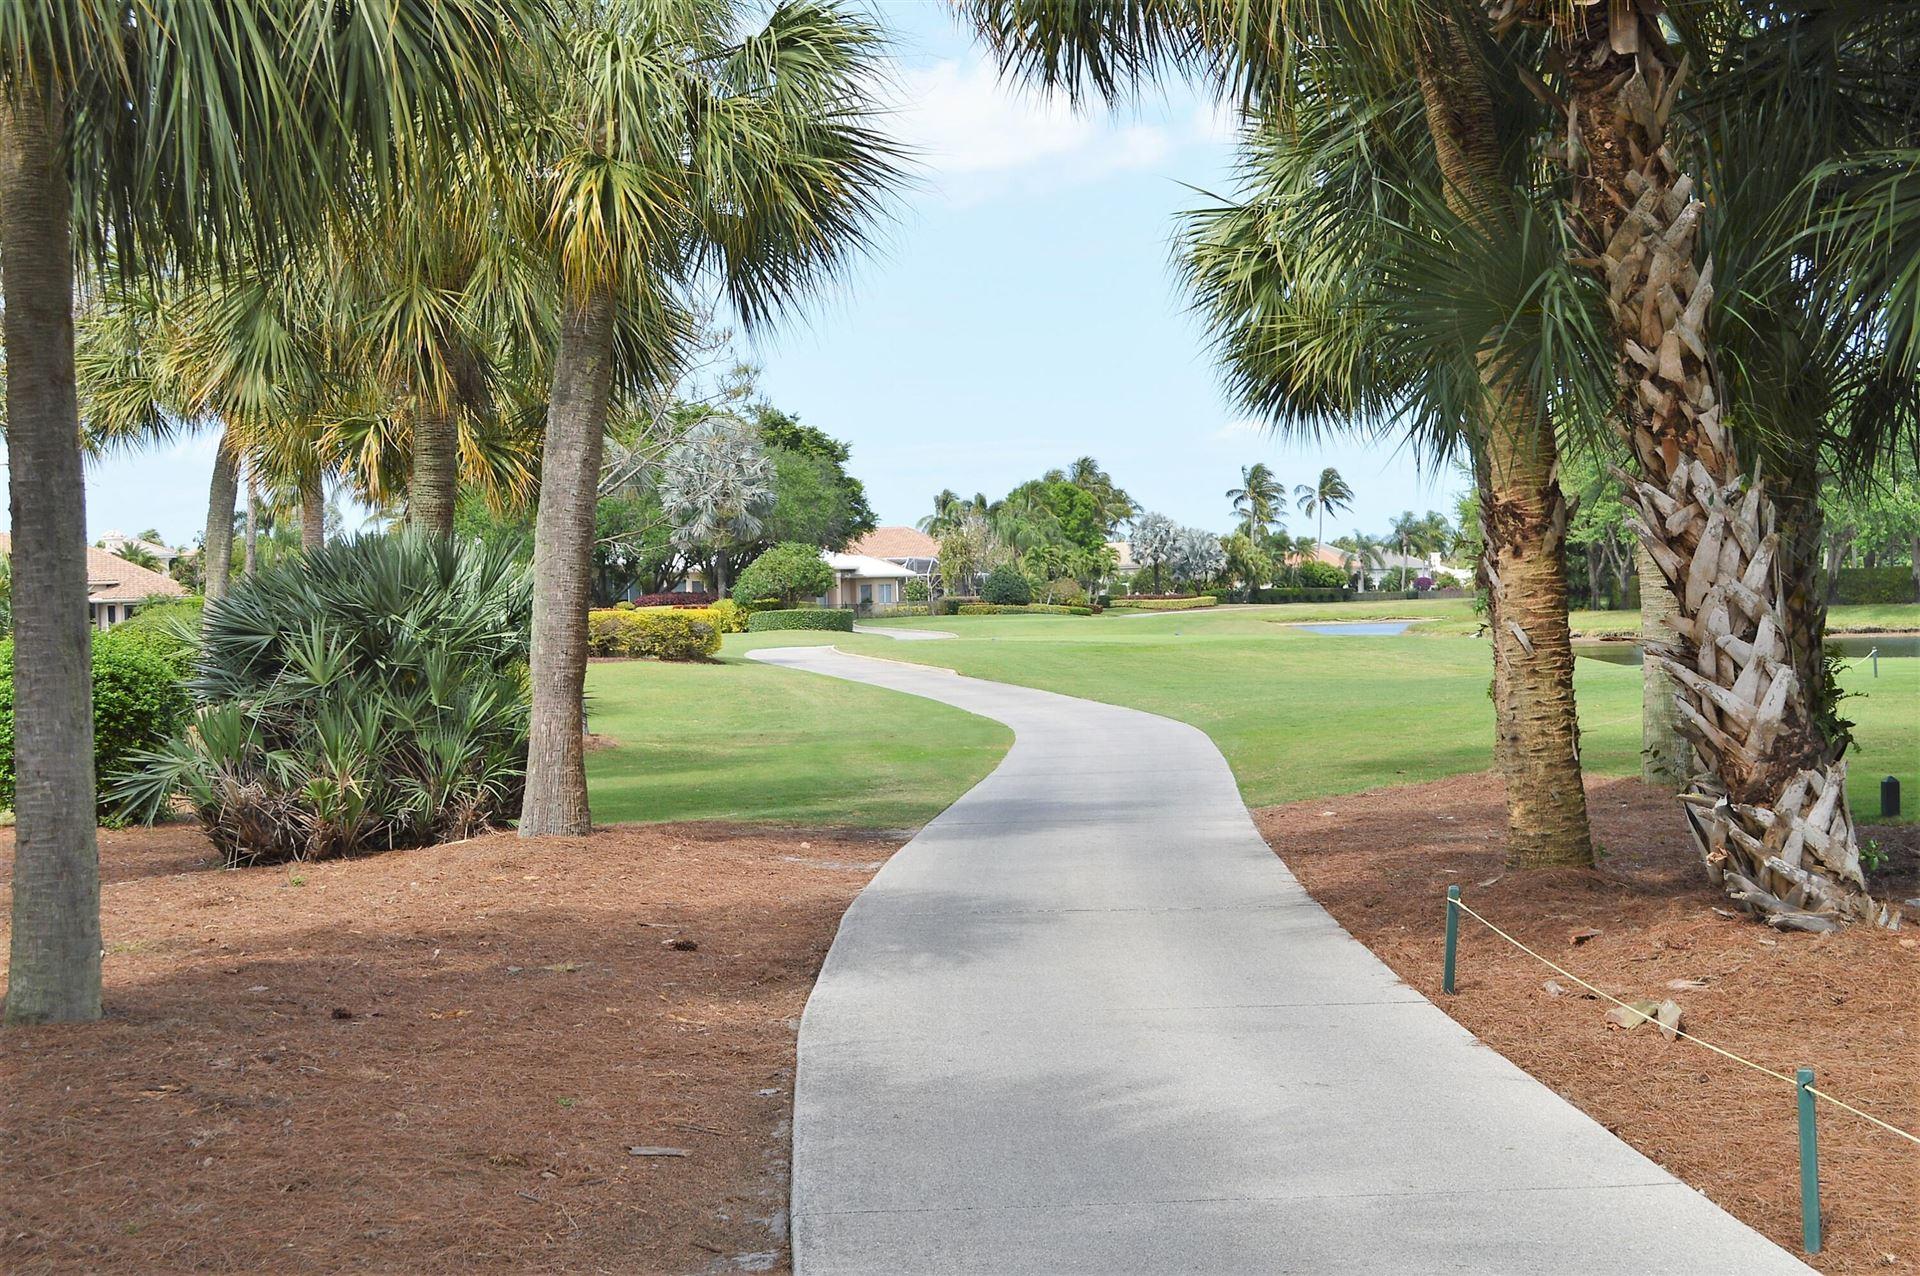 Photo of 117 Palm Point Circle #C, Palm Beach Gardens, FL 33418 (MLS # RX-10701217)